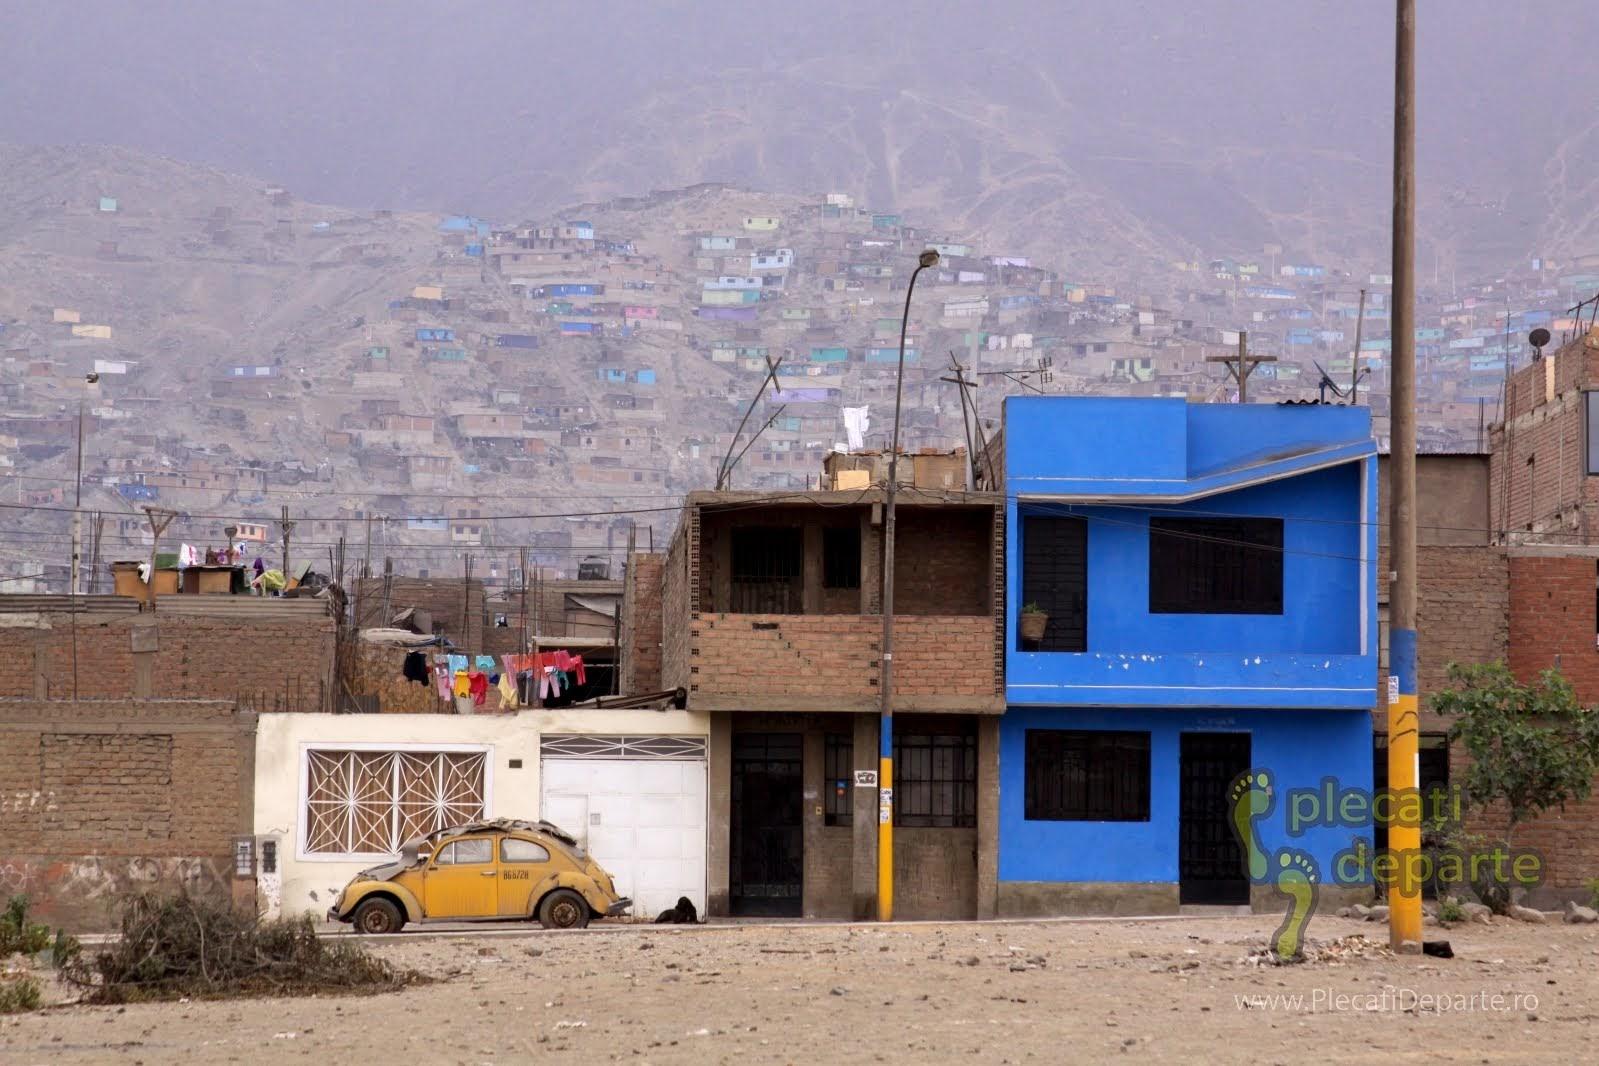 peisaj dezolant din cartierul San Juan de Lurigancho, Lima, Peru